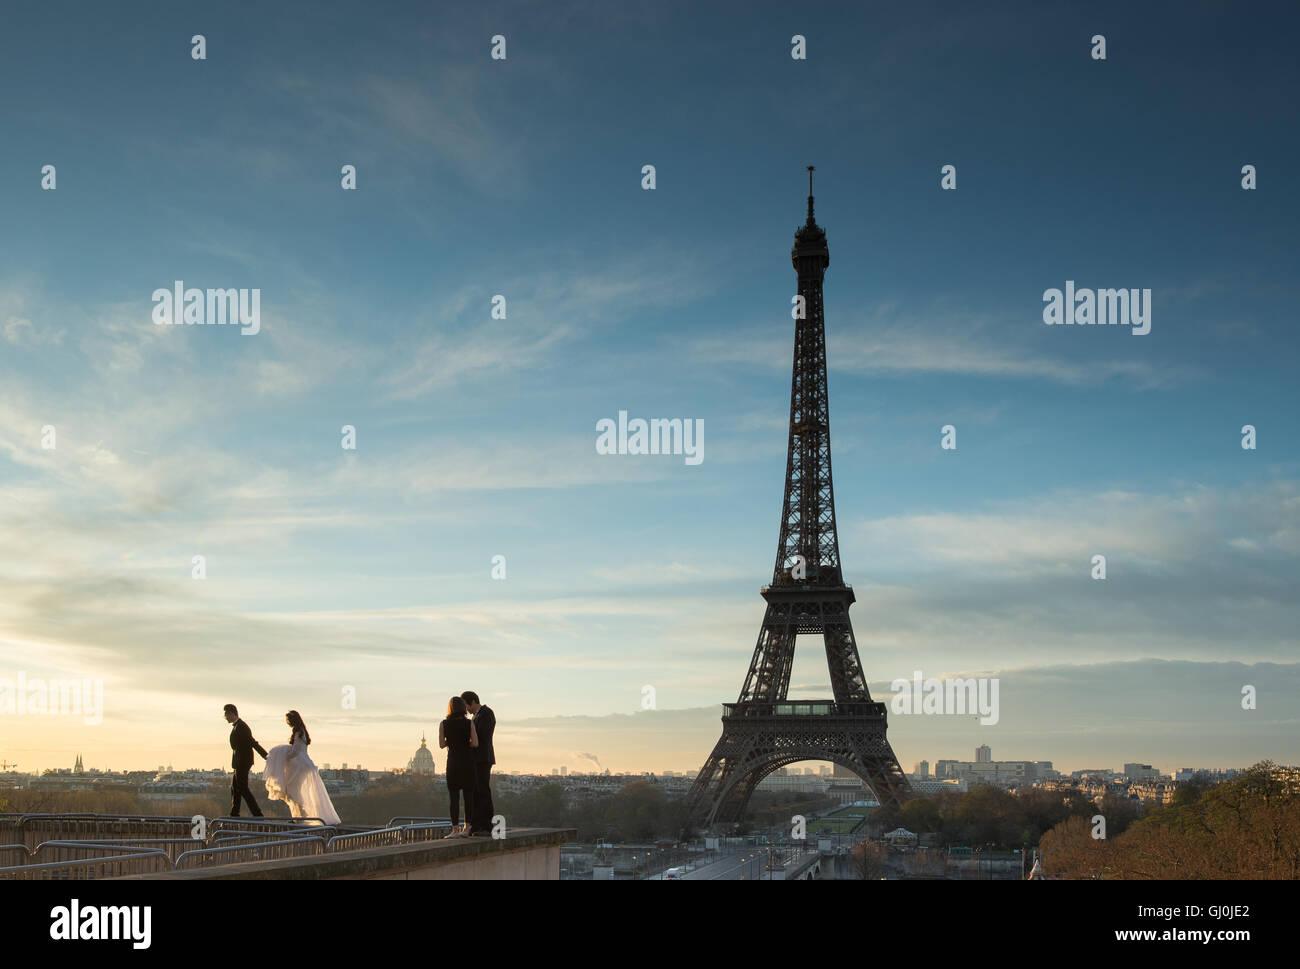 Fotografía de boda en el Palais de Chaillot con la Torre Eiffel como telón de fondo, París, Francia Imagen De Stock